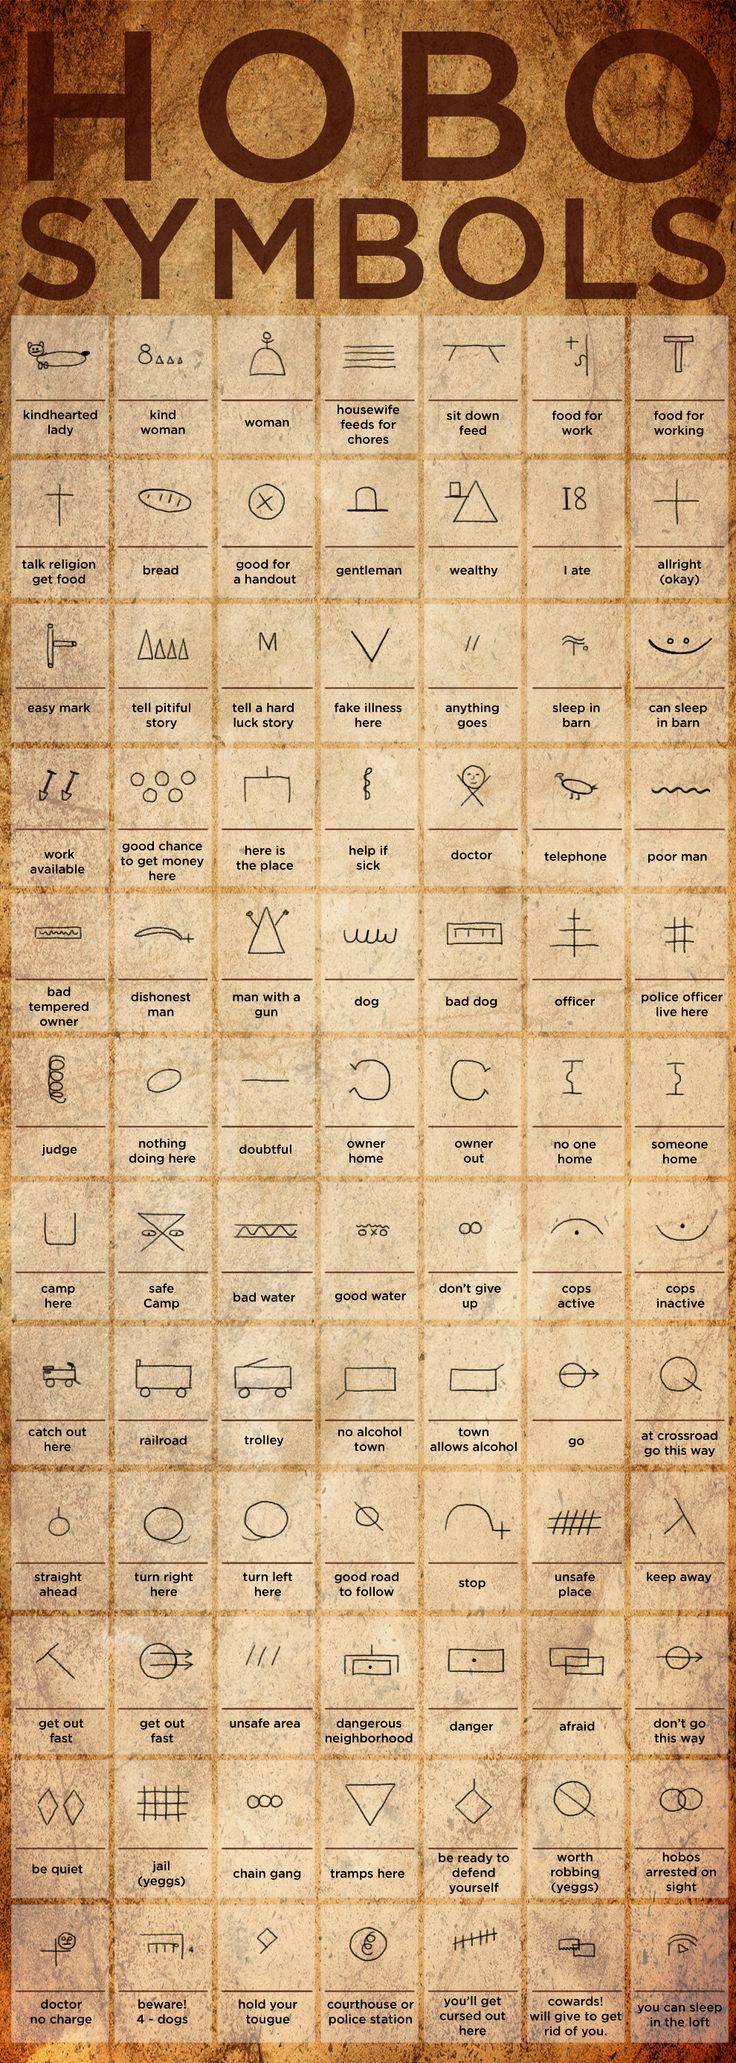 Hobo Symbols. - http://www.survivalacademy.co/